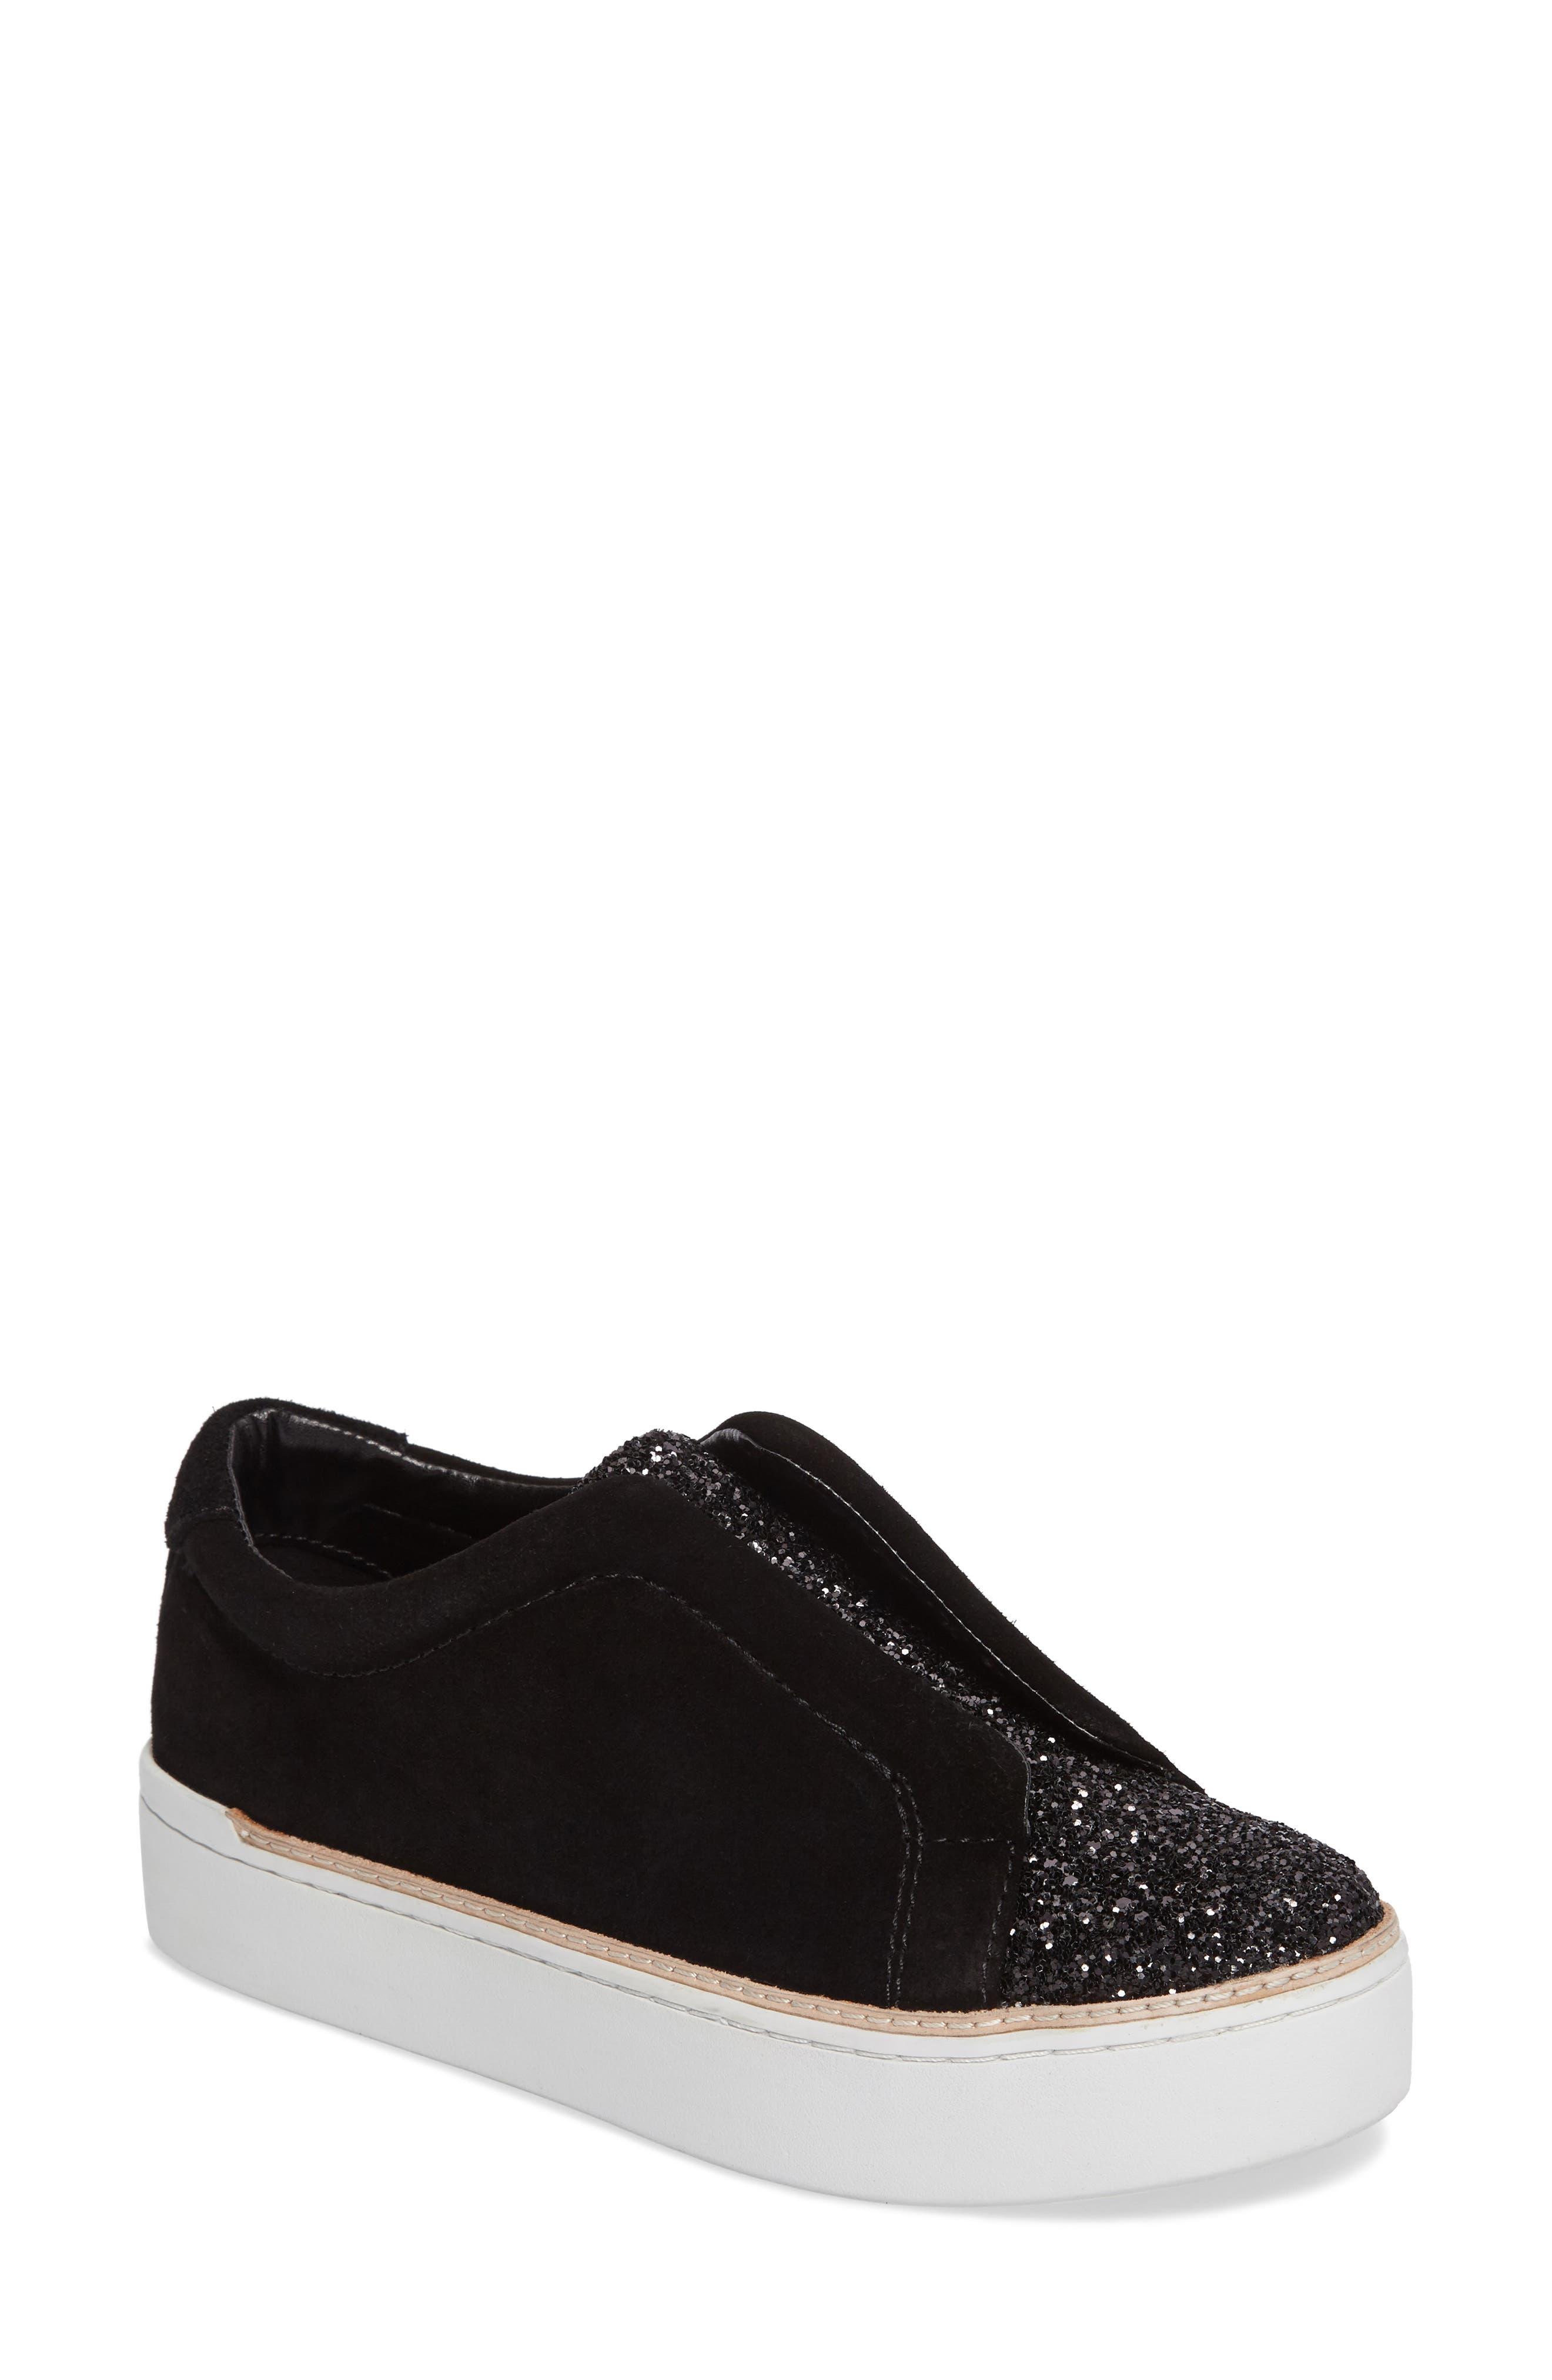 M4D3,                             Super Slip-On Sneaker,                             Main thumbnail 1, color,                             BLACK GLITTER LEATHER